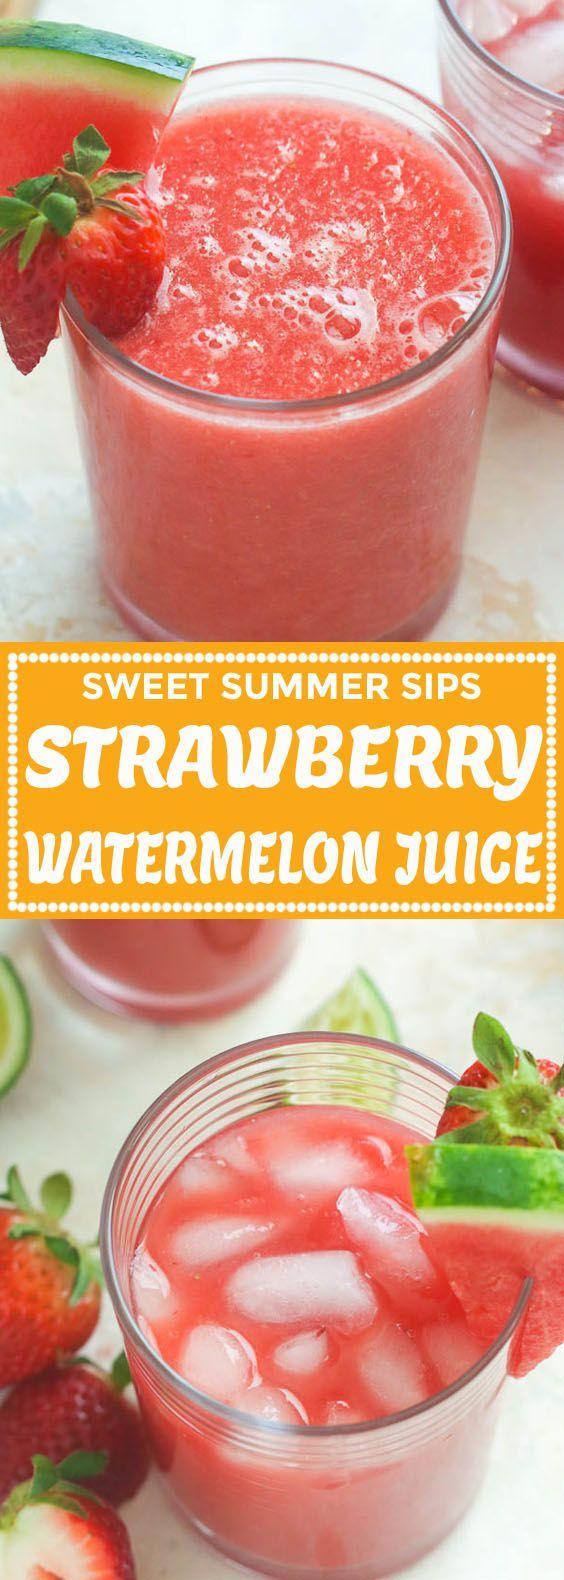 Strawberry Watermelon Juice In 2020 Strawberry Watermelon Watermelon Juice Recipes